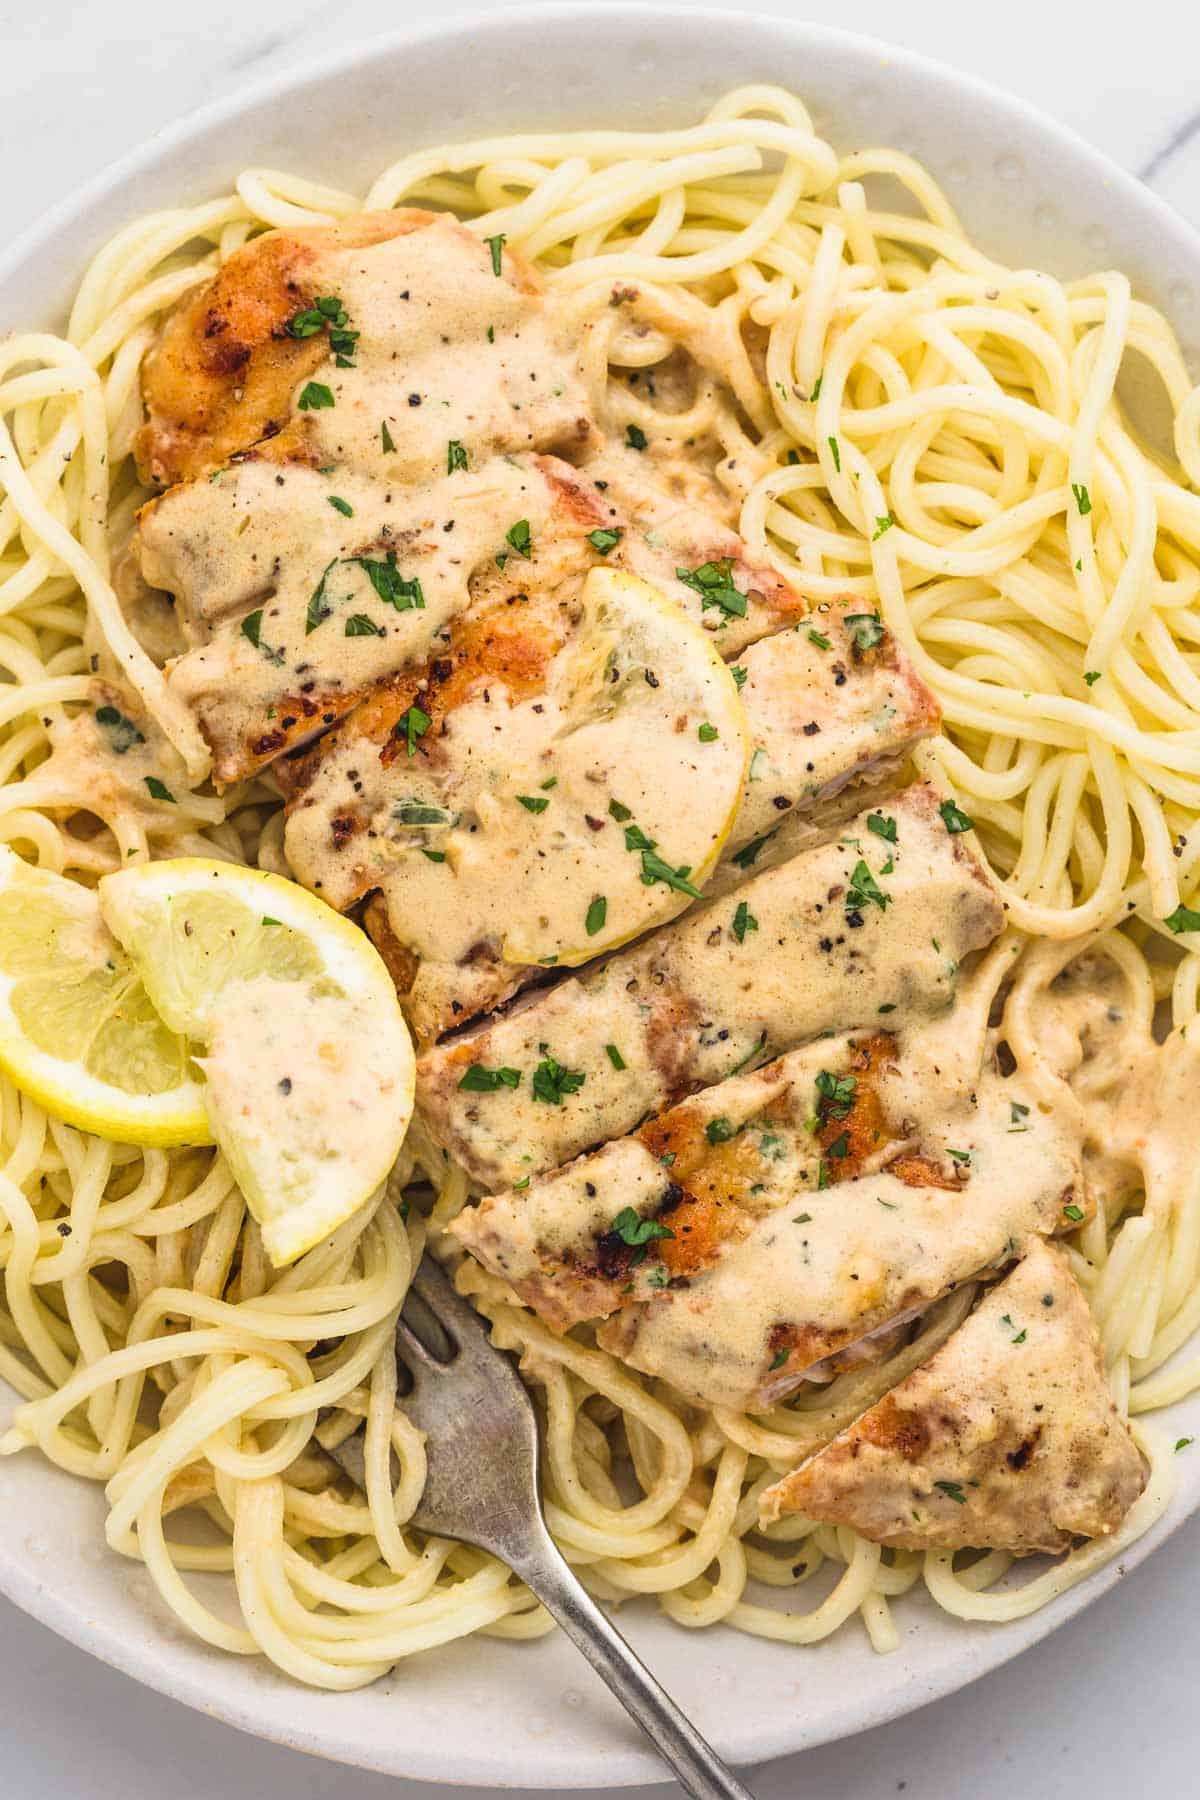 creamy lemon chicken served over pasta